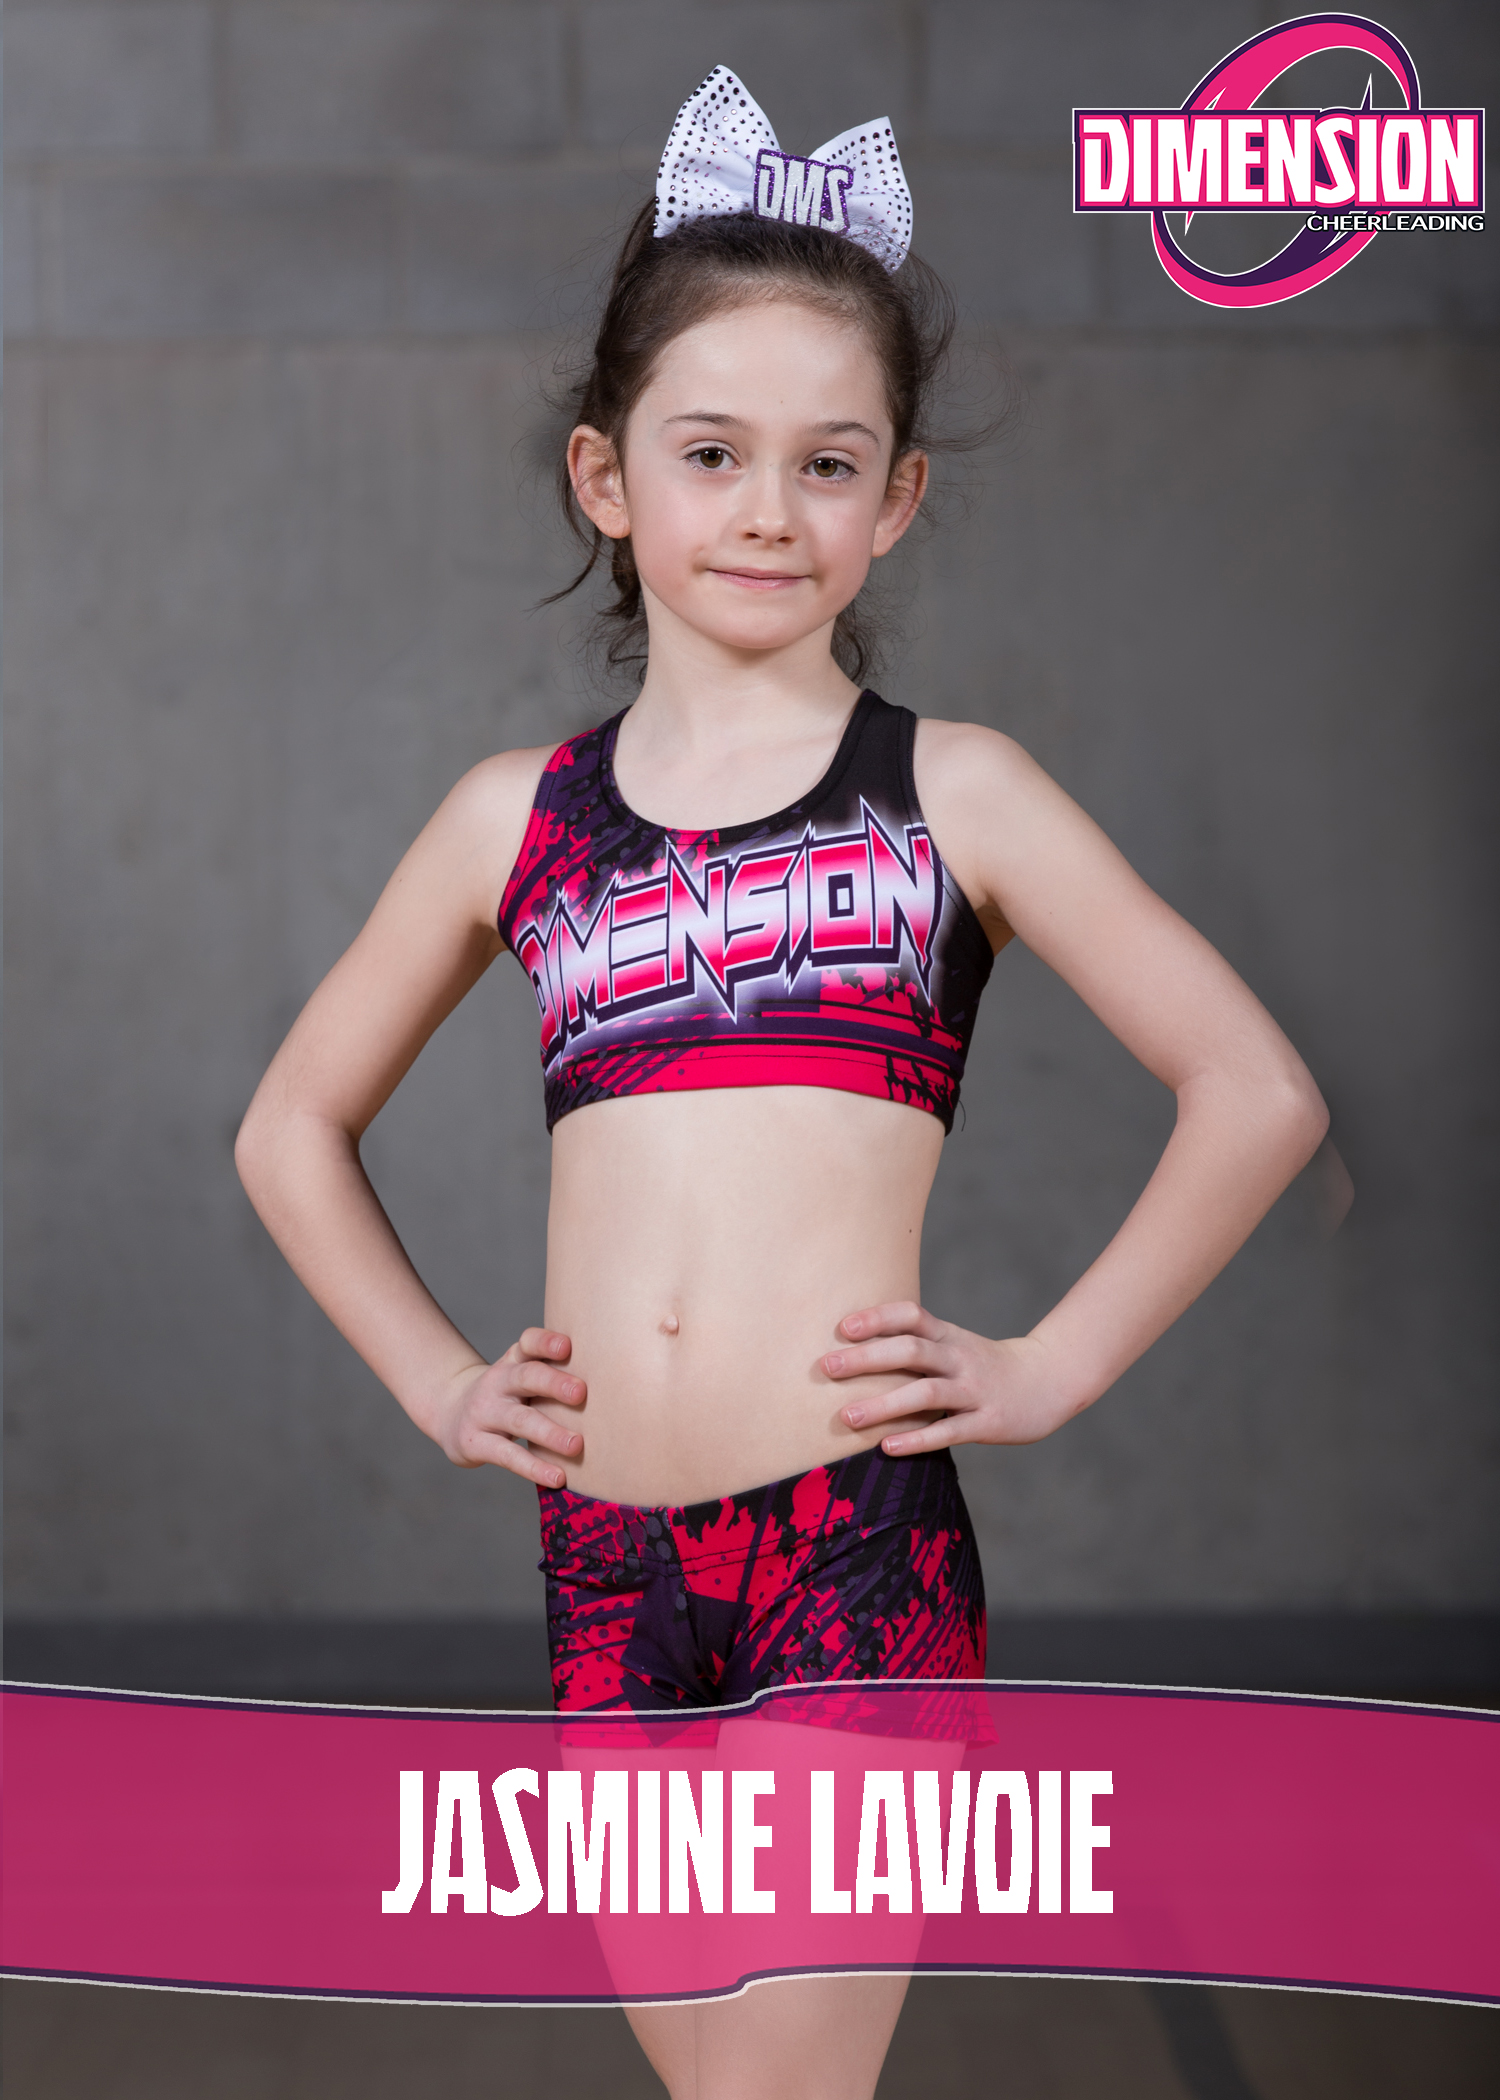 Jasmine Lavoie